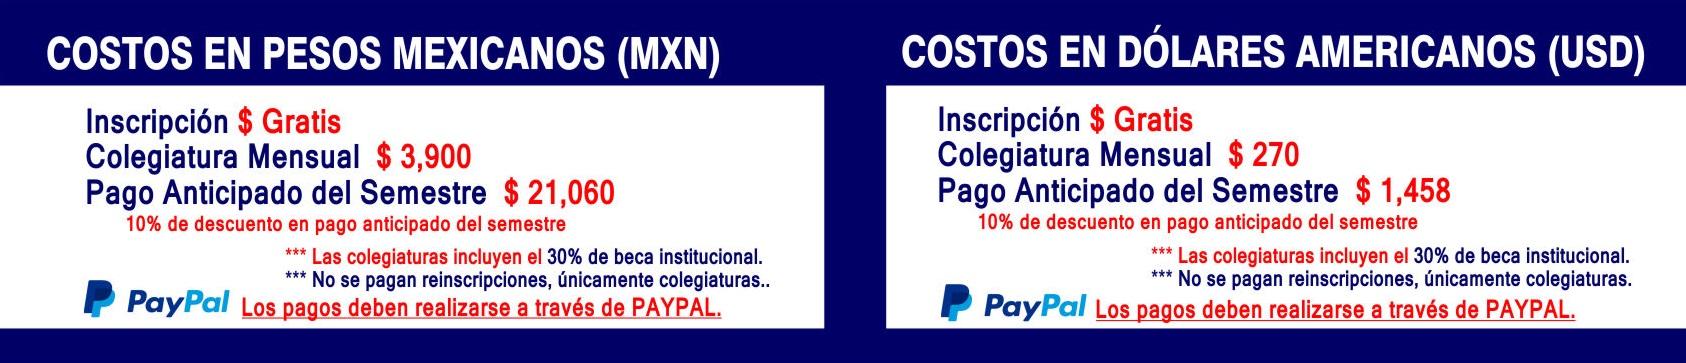 Costos Doctorados (D)